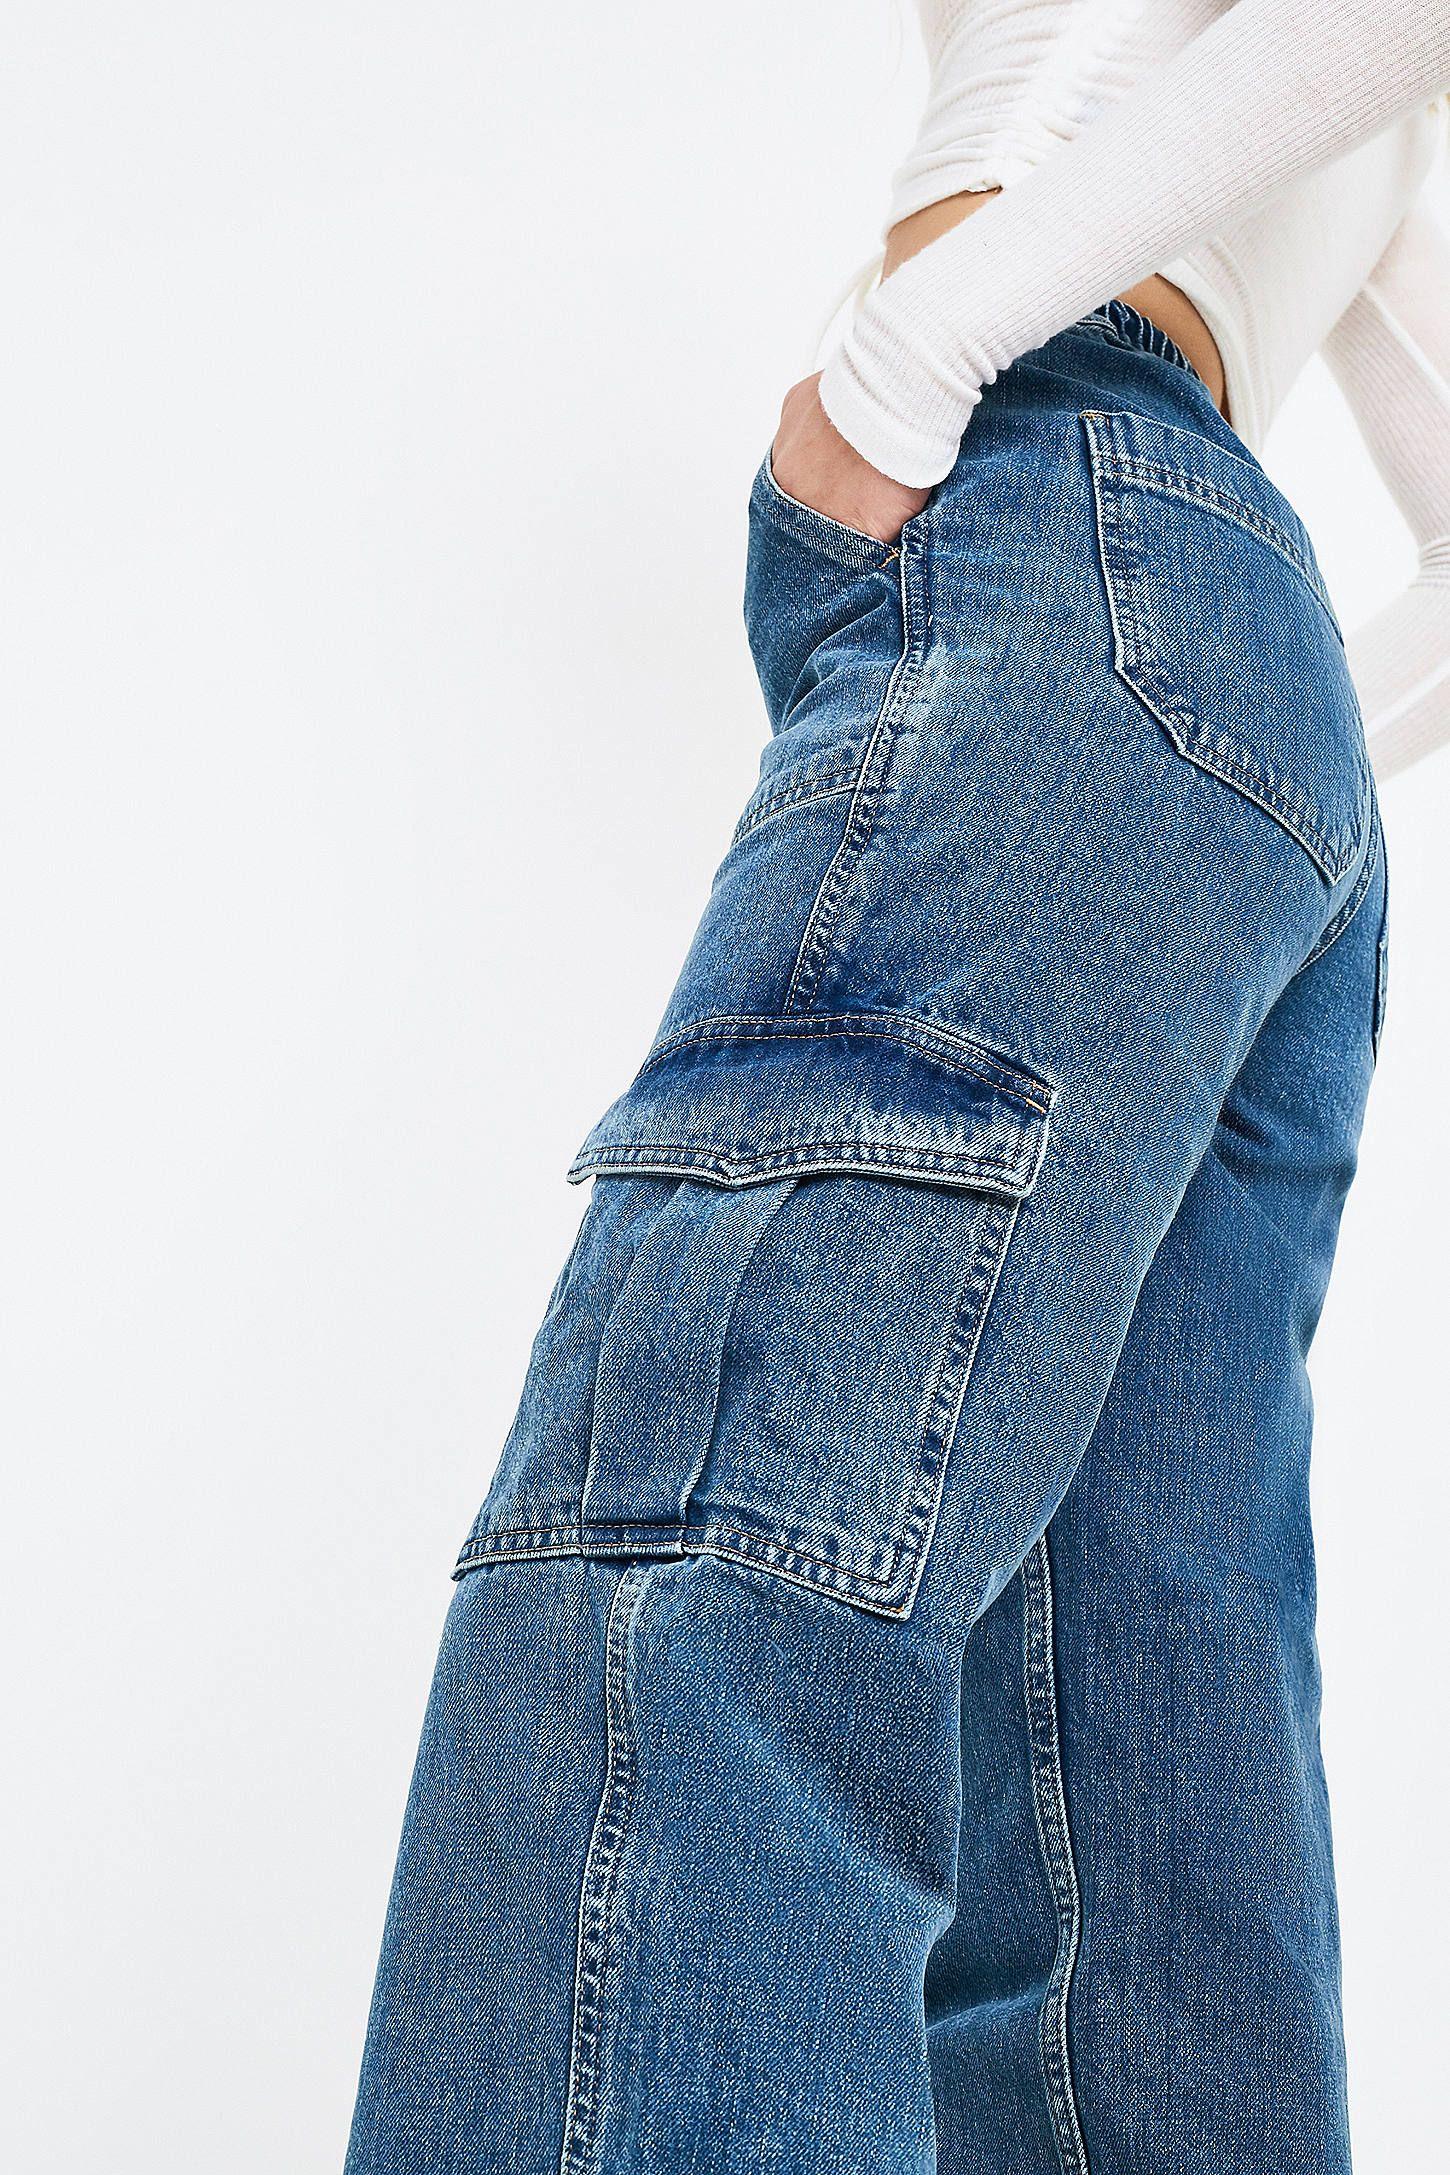 Photo of BDG denim skate jeans